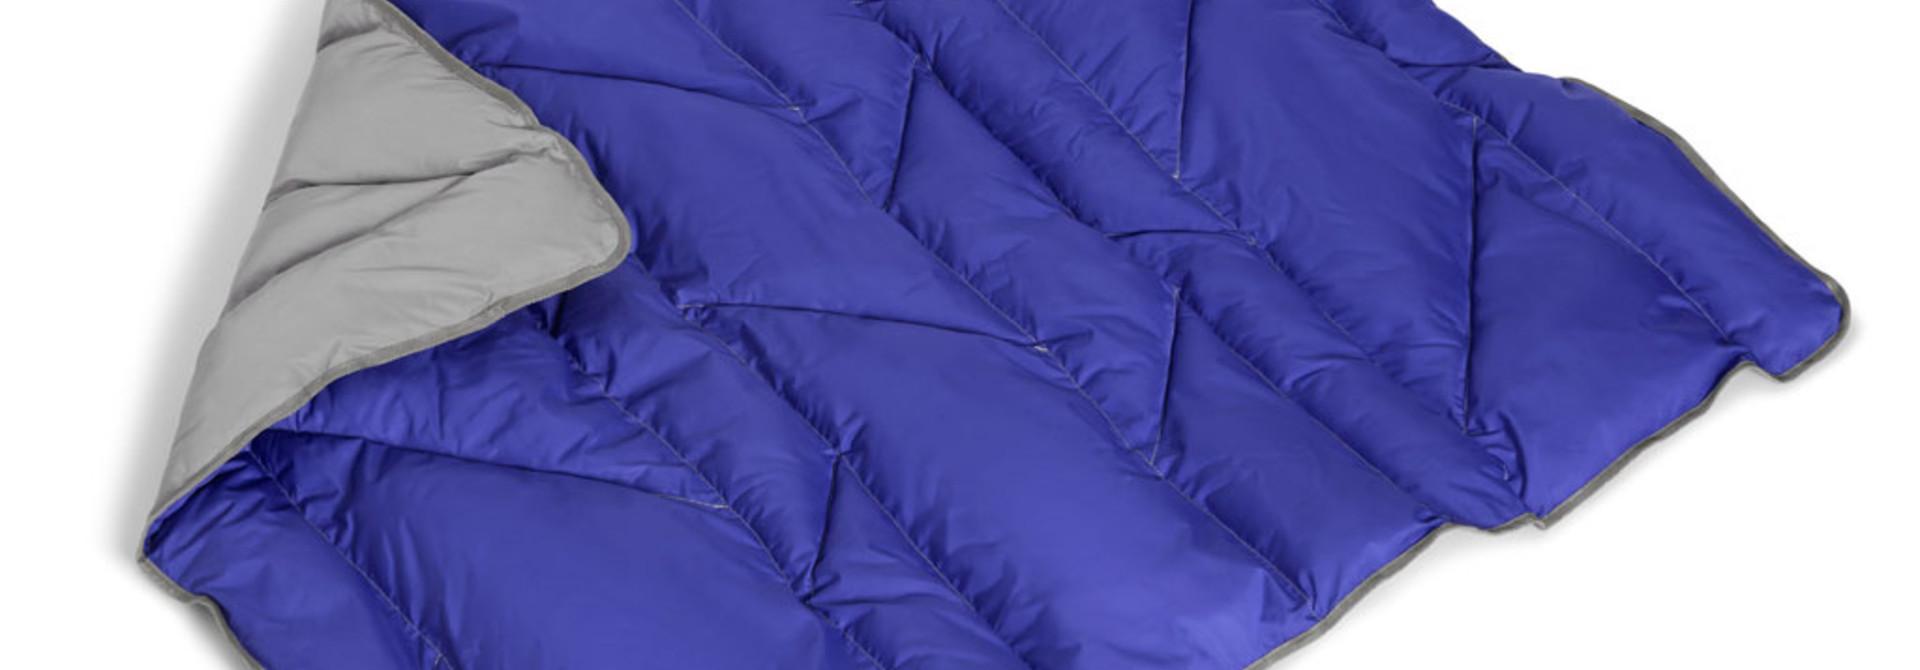 Ruffwear Clear Lake™ Blanket